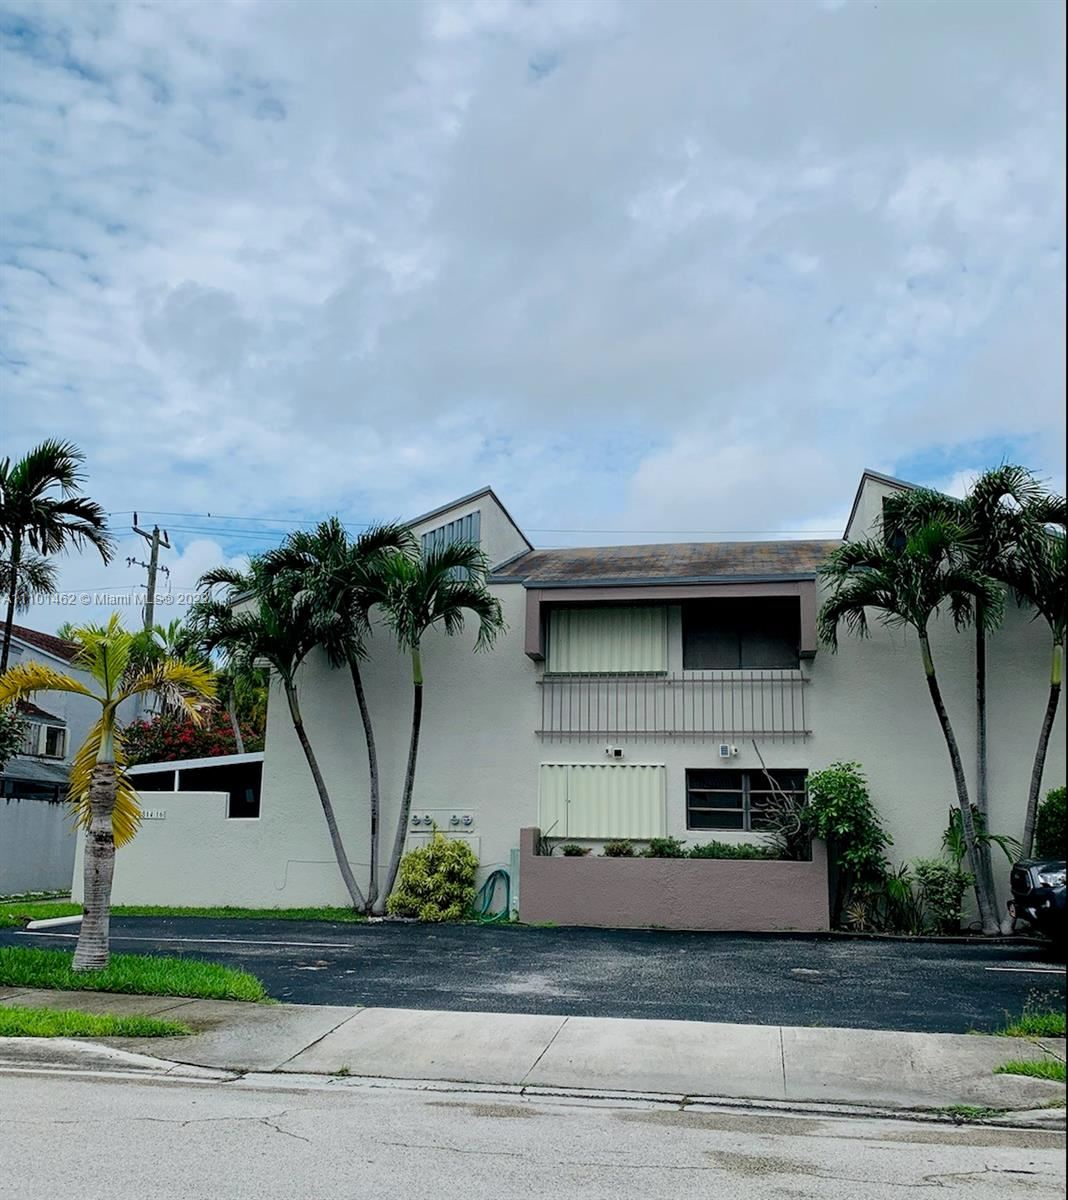 Photo of 15814 SW 91st Ct #D, Palmetto Bay, FL 33157 (MLS # A11101462)